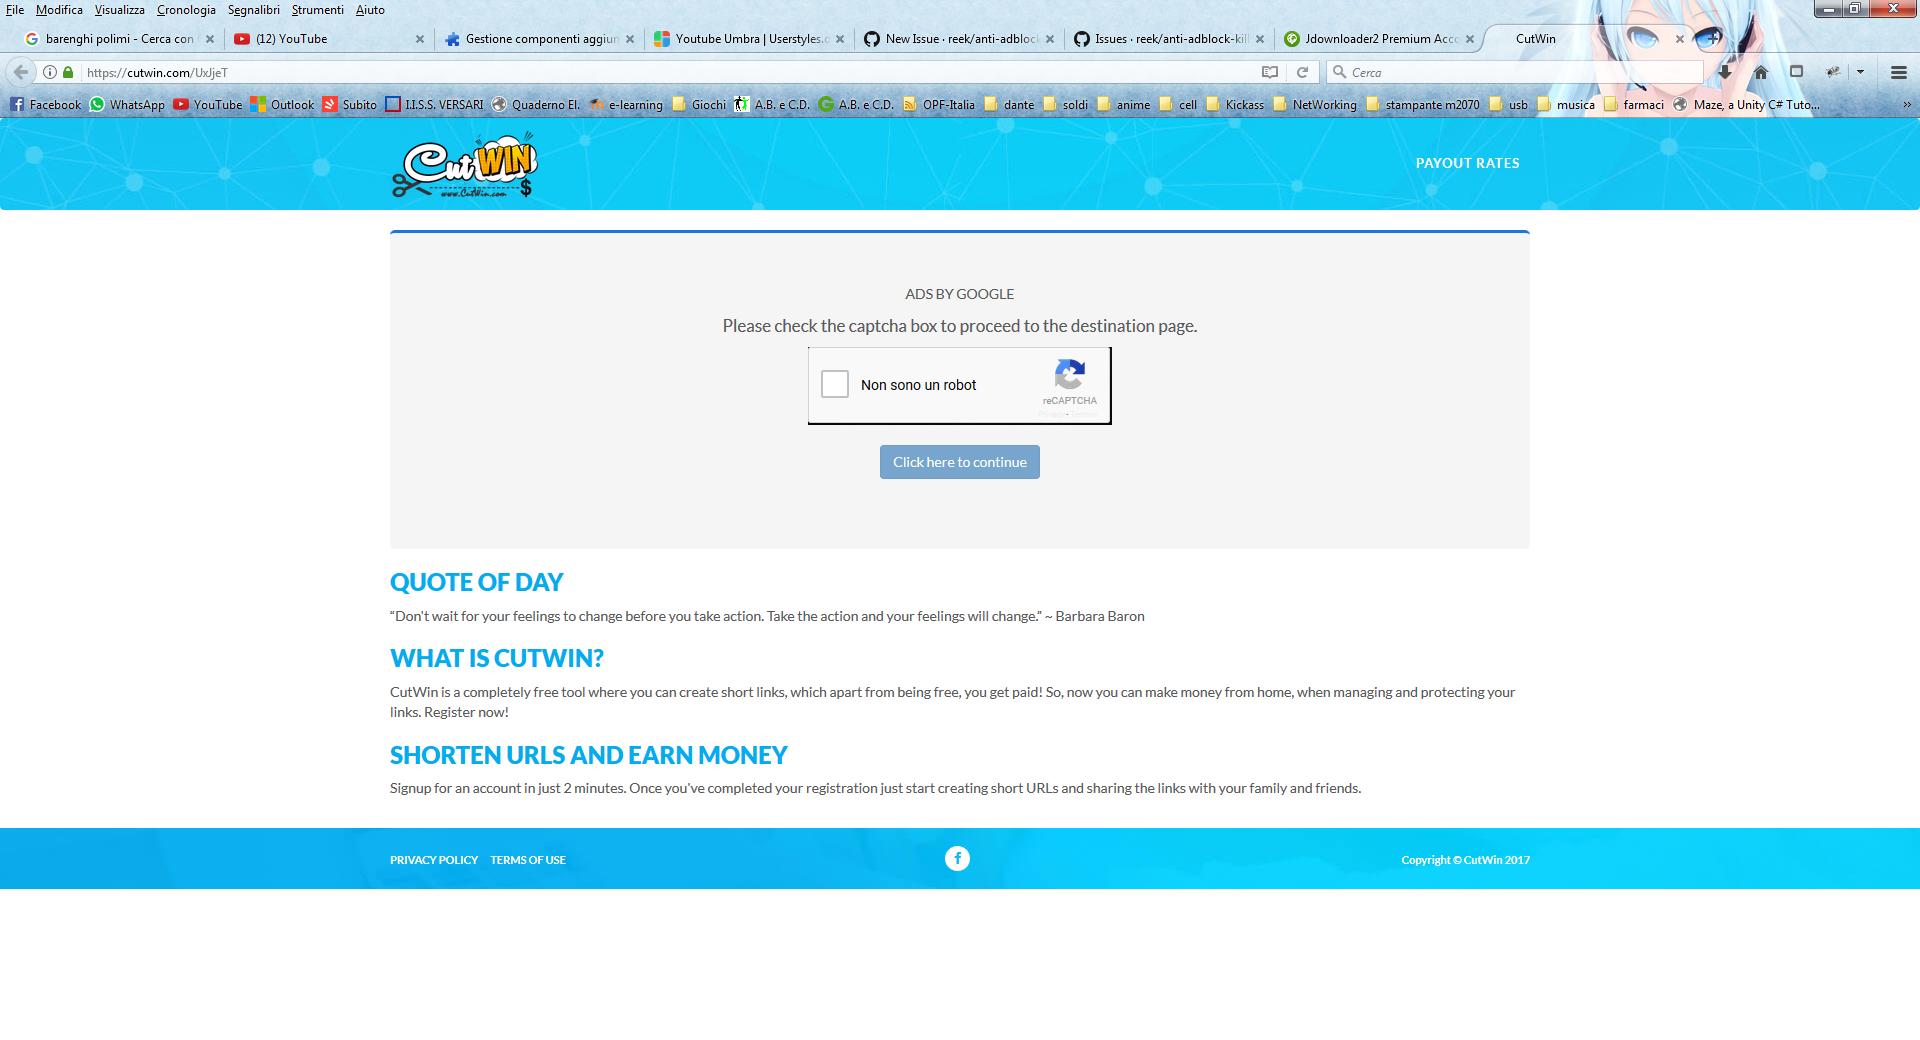 Adblock detected in cutwin com · Issue #3515 · reek/anti